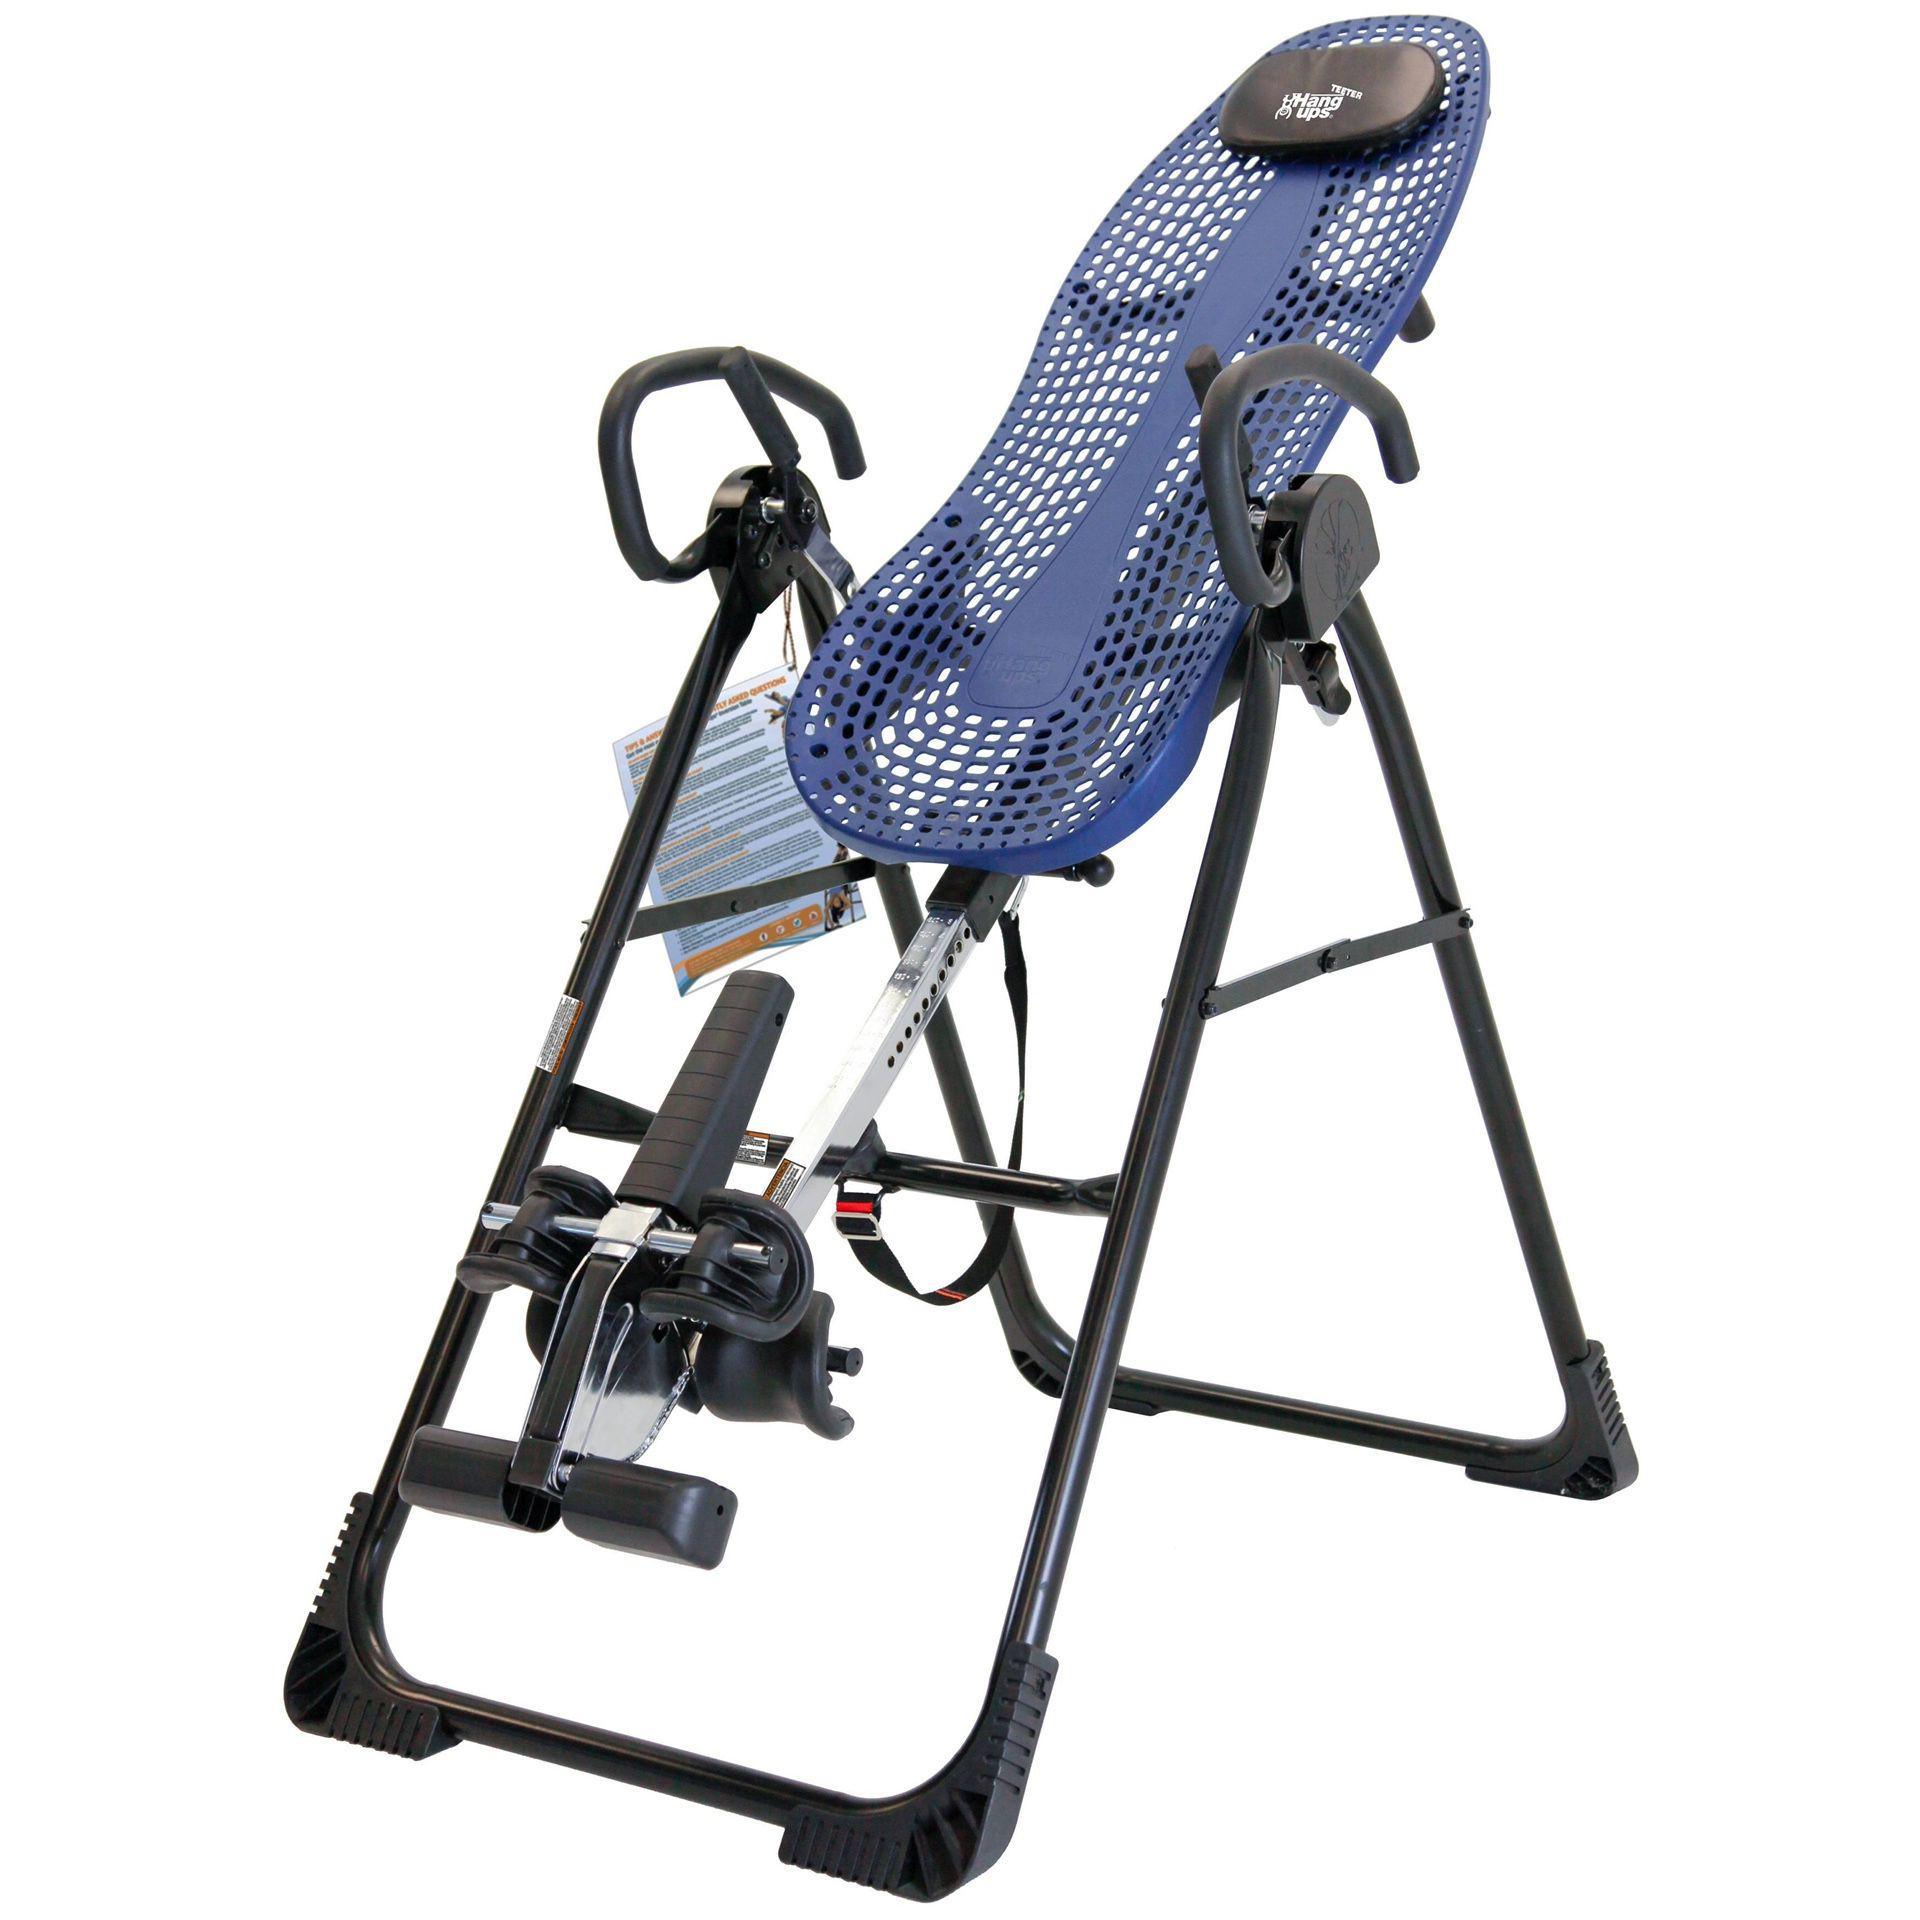 Teeter Hang Ups EP-950 Plus Inversion Table